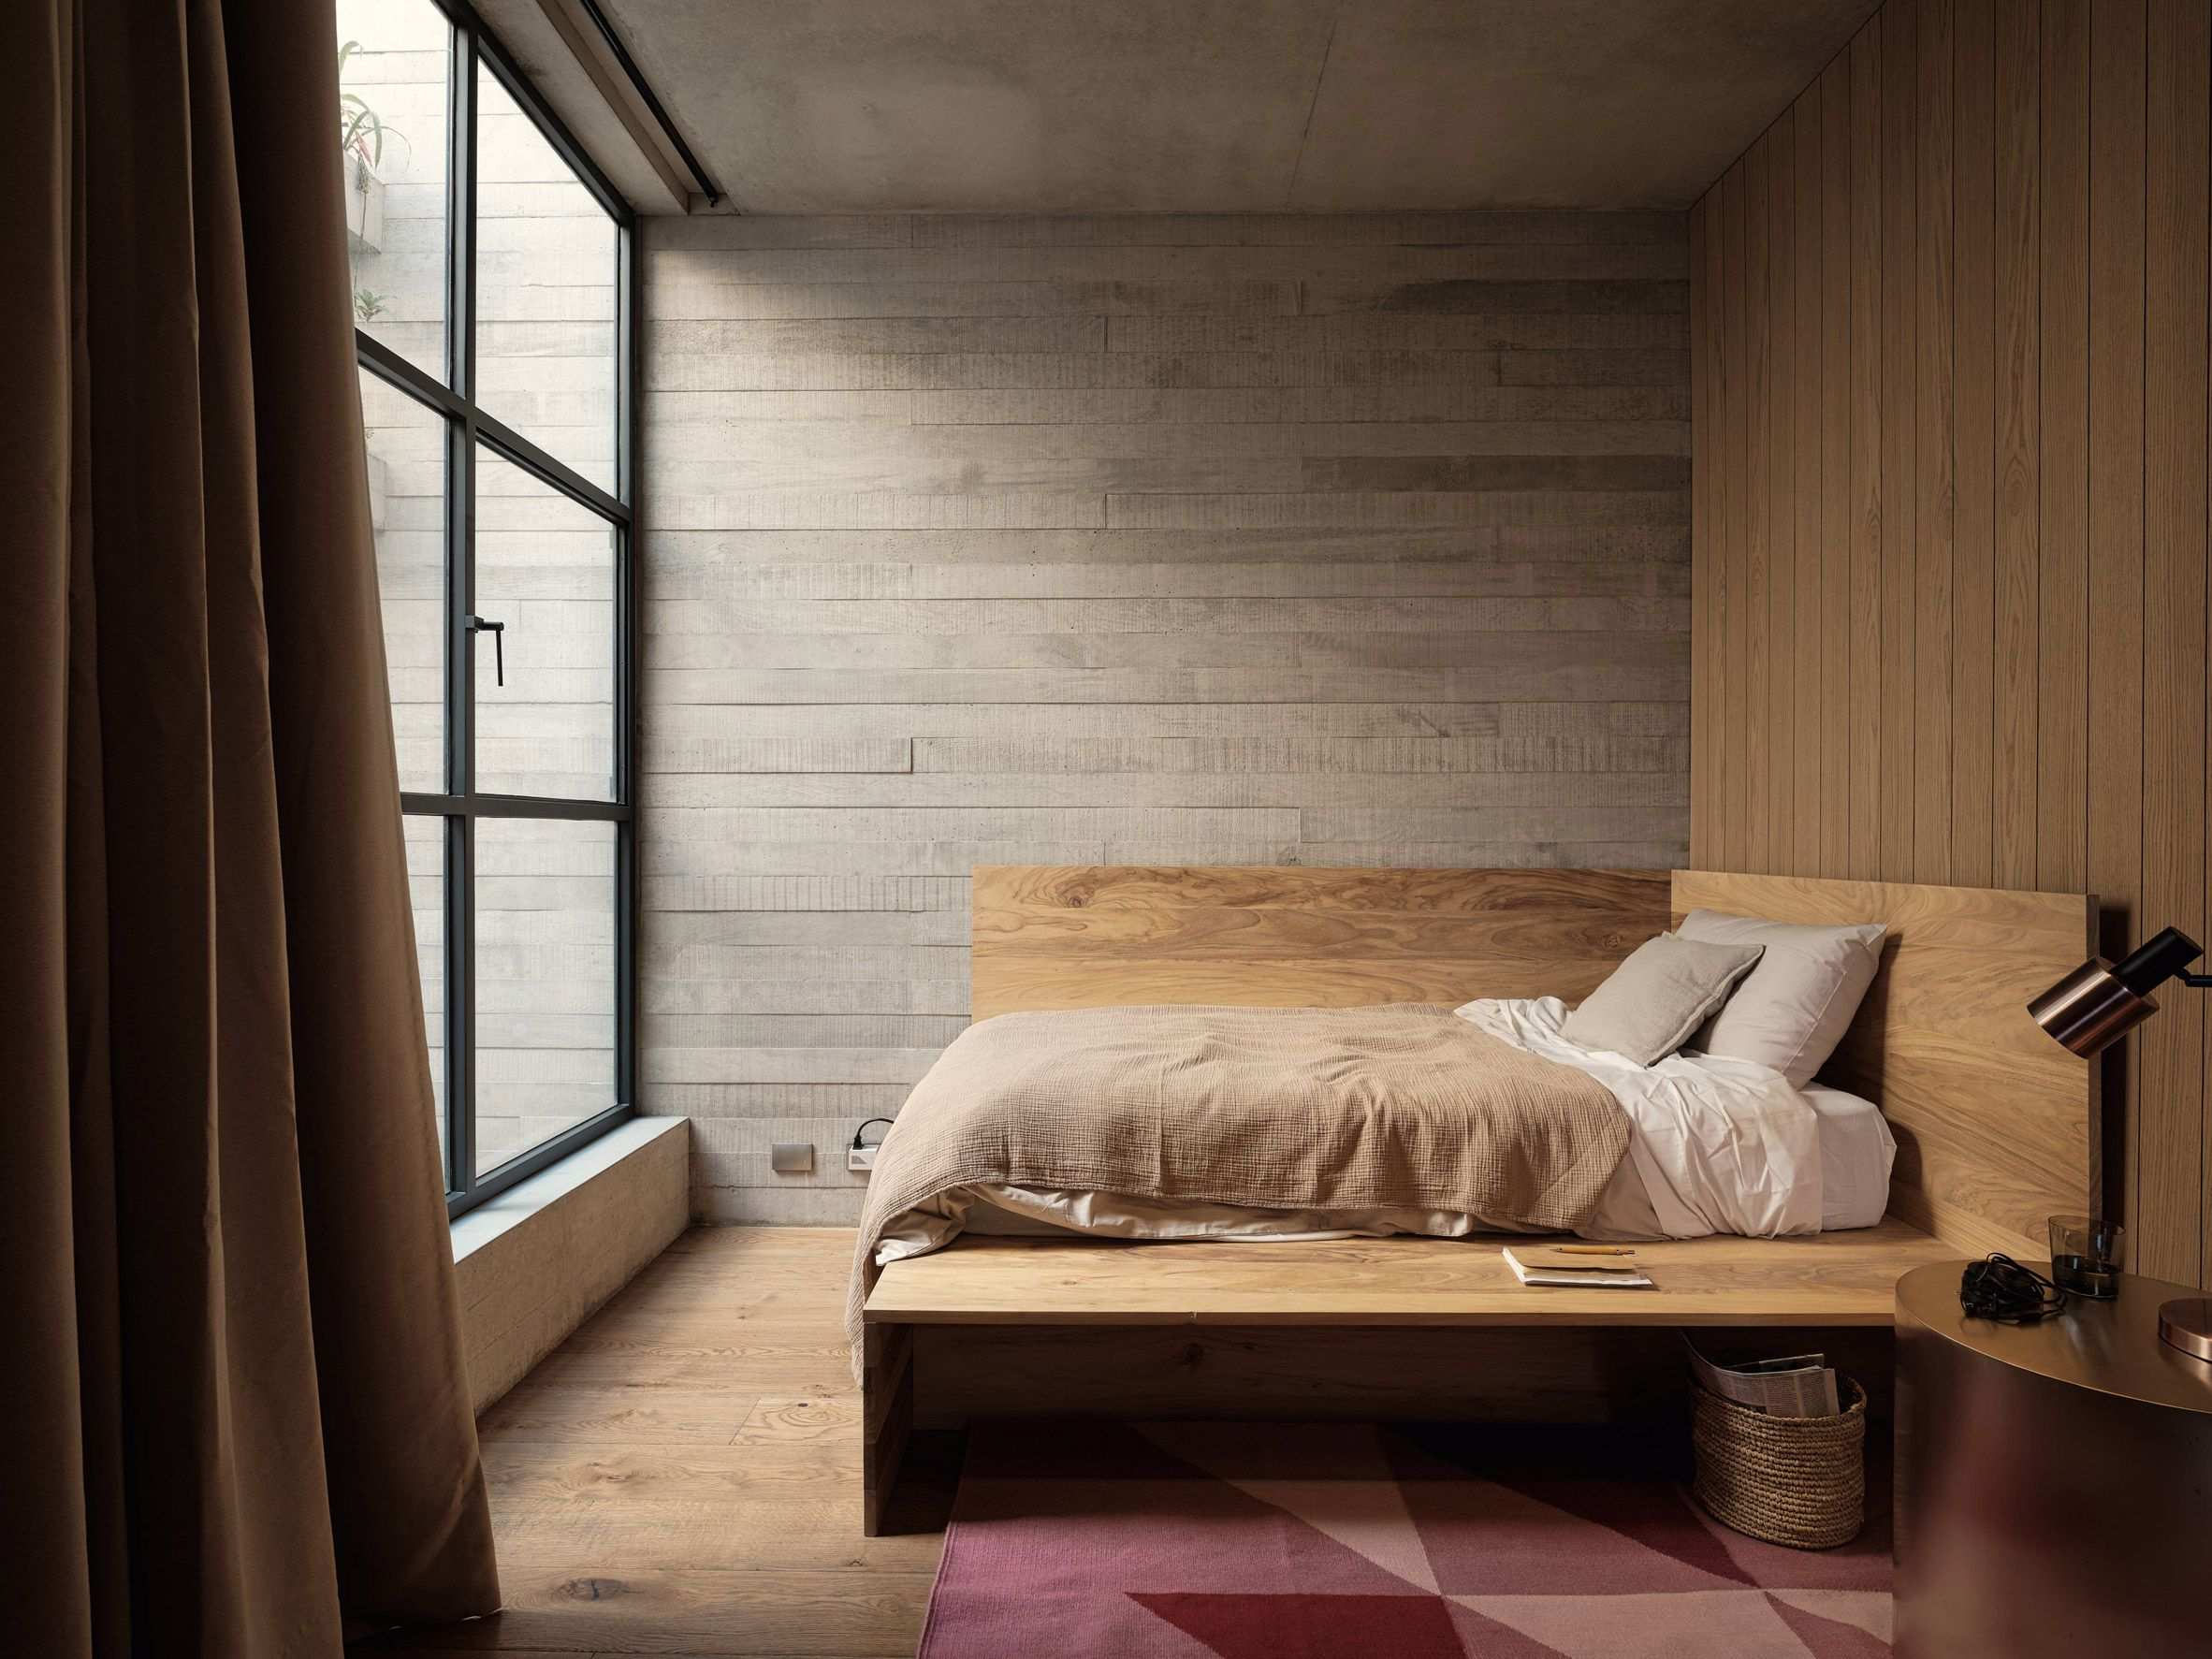 Studio Rick Joy Designs Concrete Apartments Polanco In Mexico City Concrete Design Interior Built In Bed